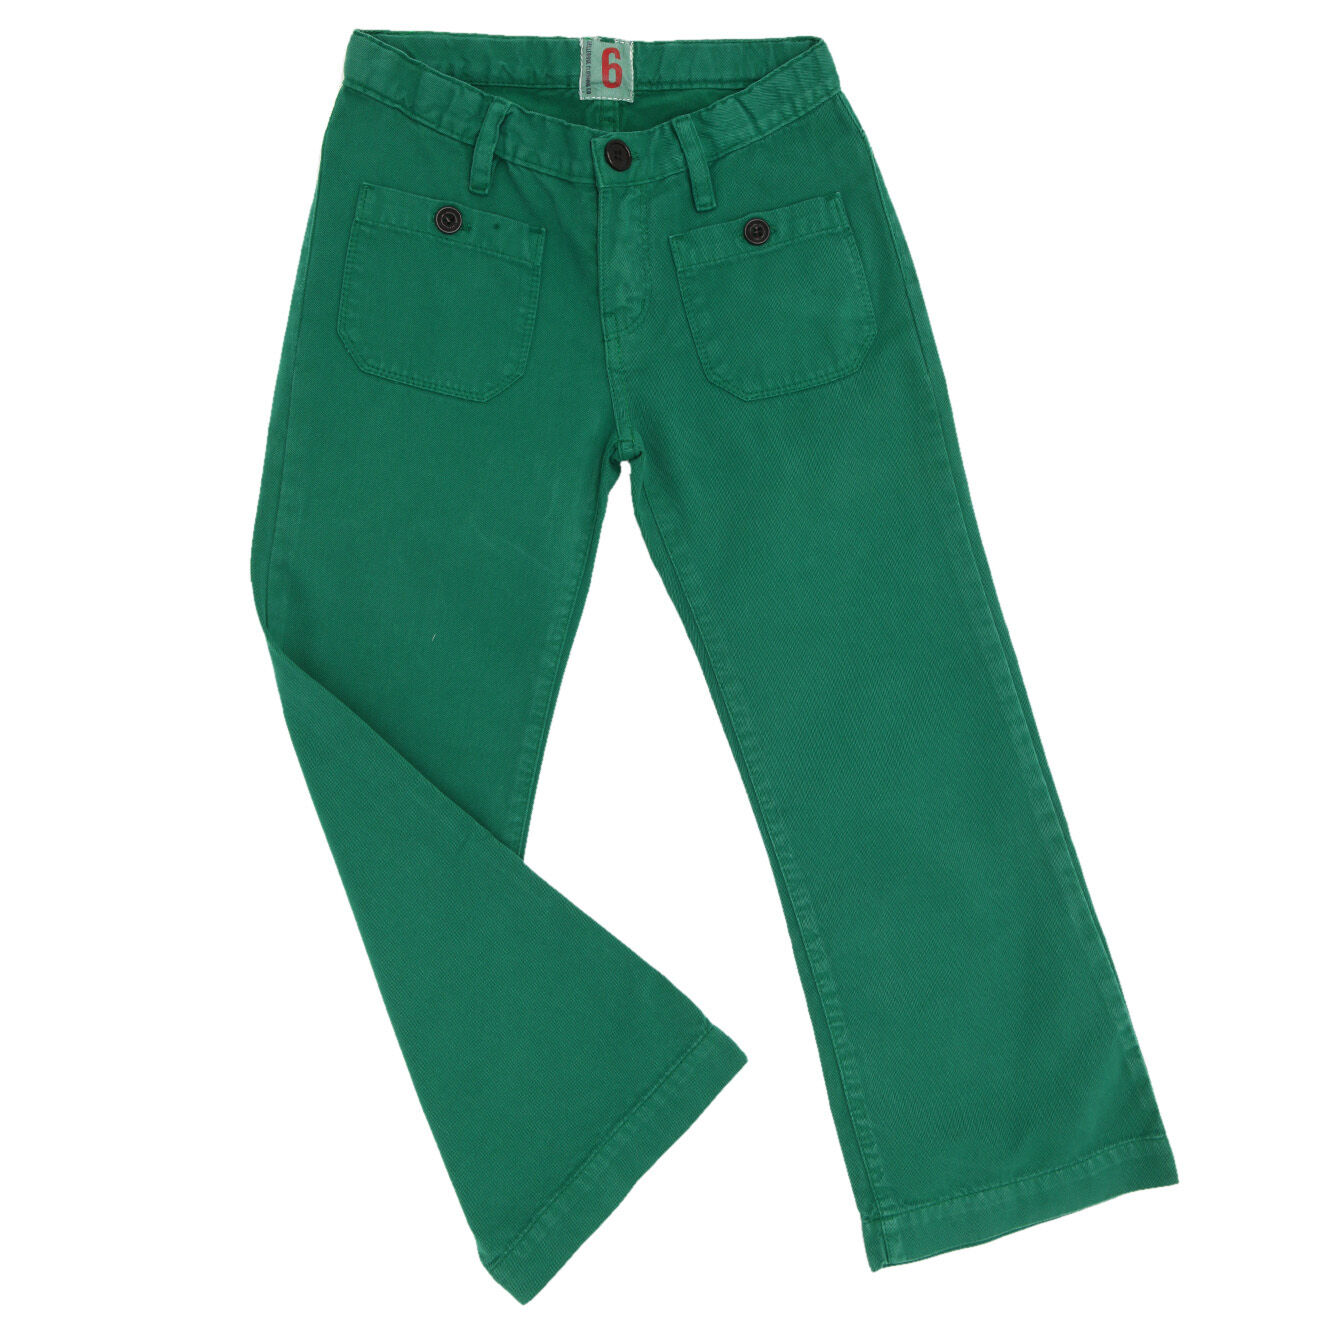 Pantalon varana coton vert